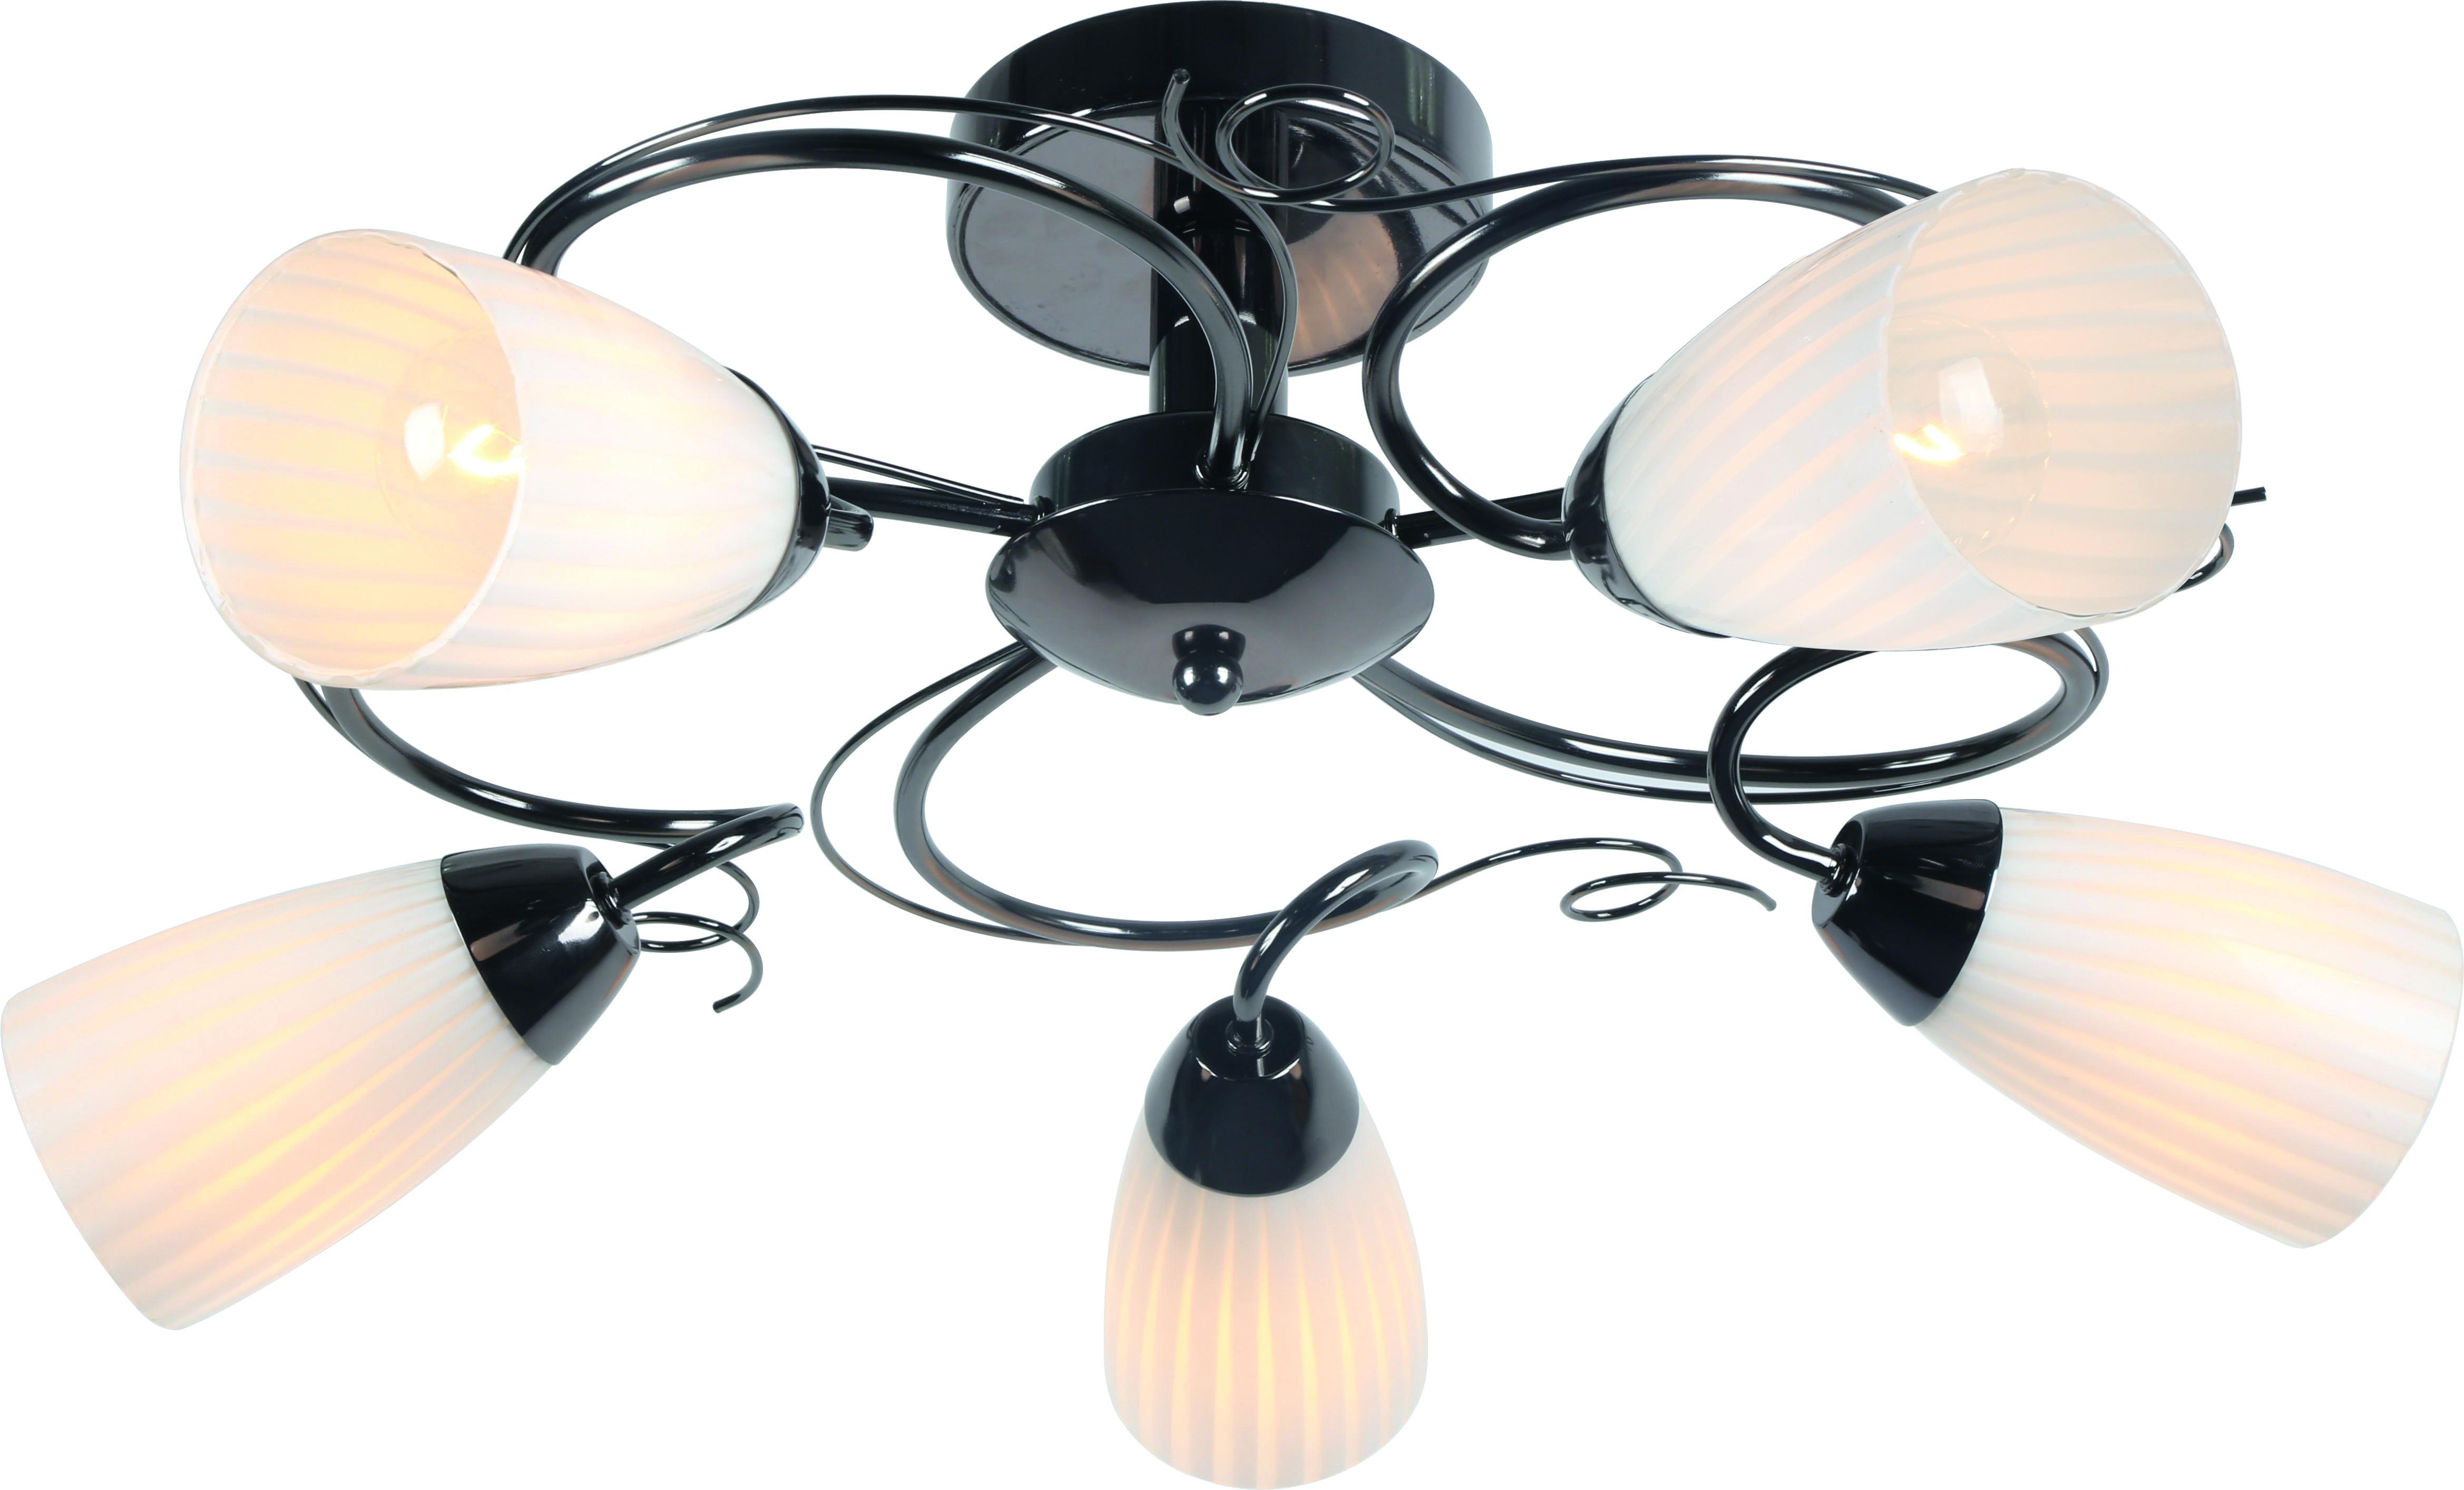 Люстра Arte lamp A6545pl-5bc люстра на штанге arte lamp alessia a6545pl 3bc